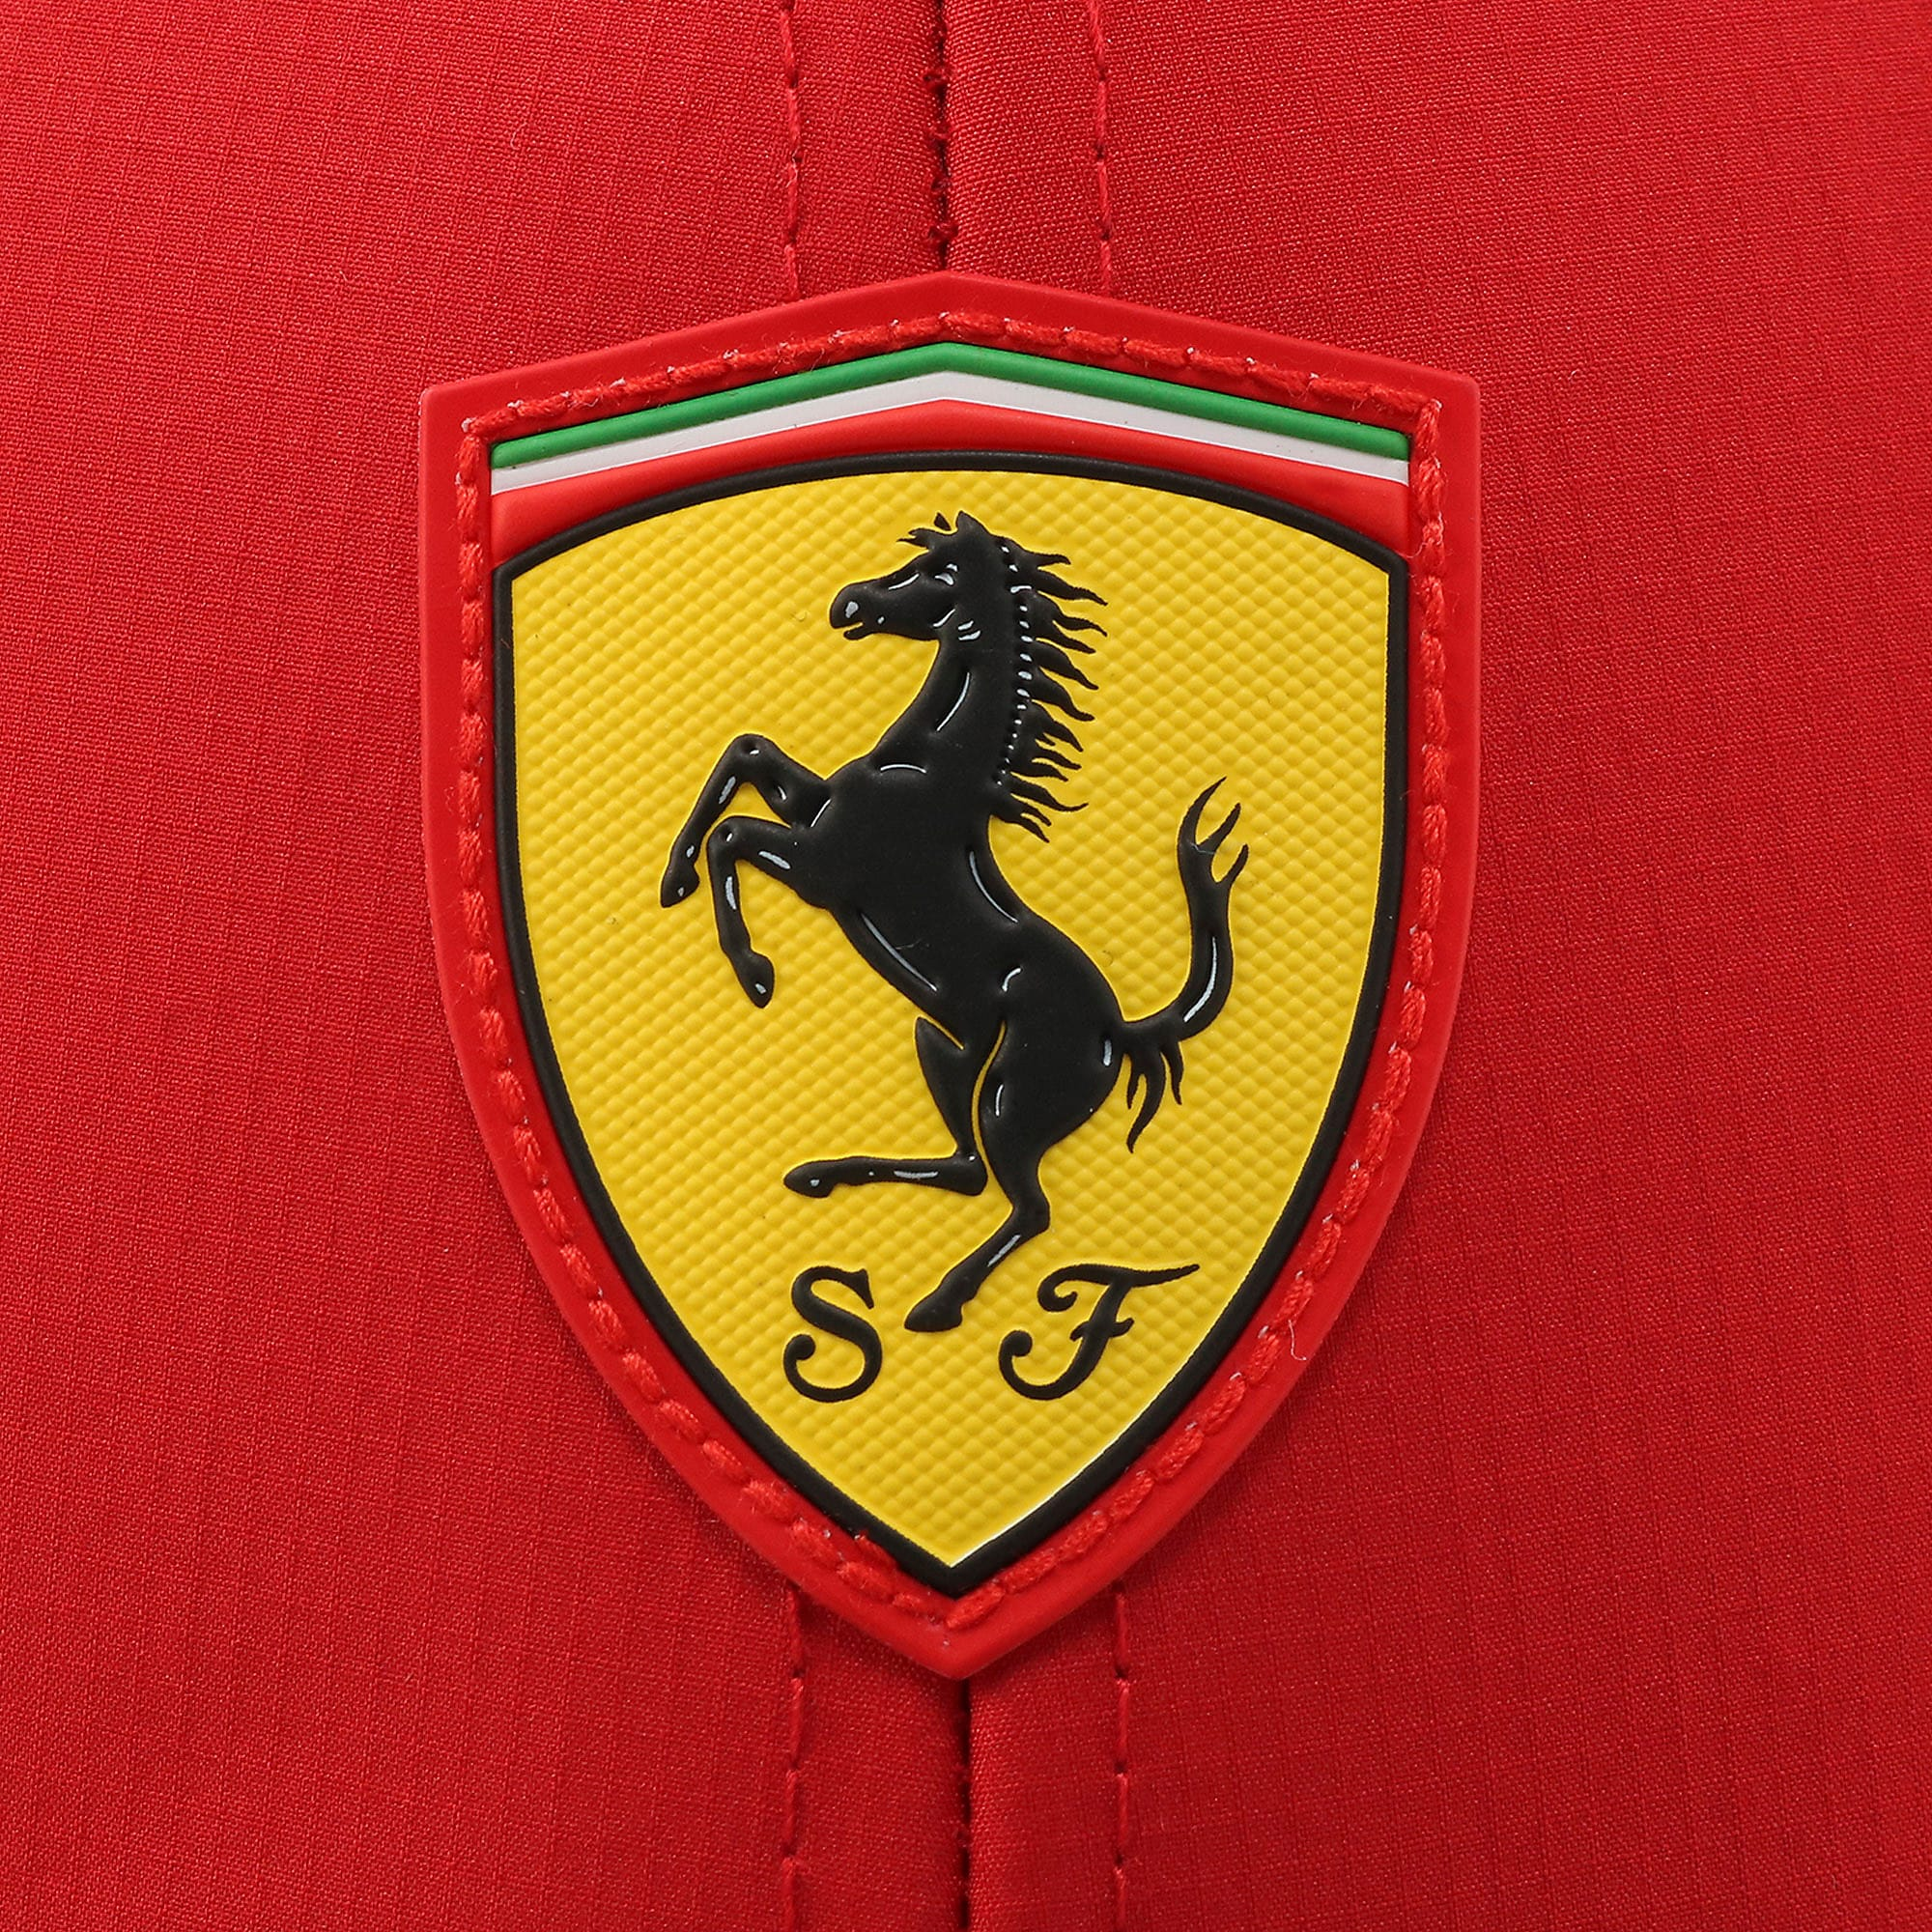 Thumbnail 6 of フェラーリ ファンウェア ベースボール キャップ, Rosso Corsa, medium-JPN